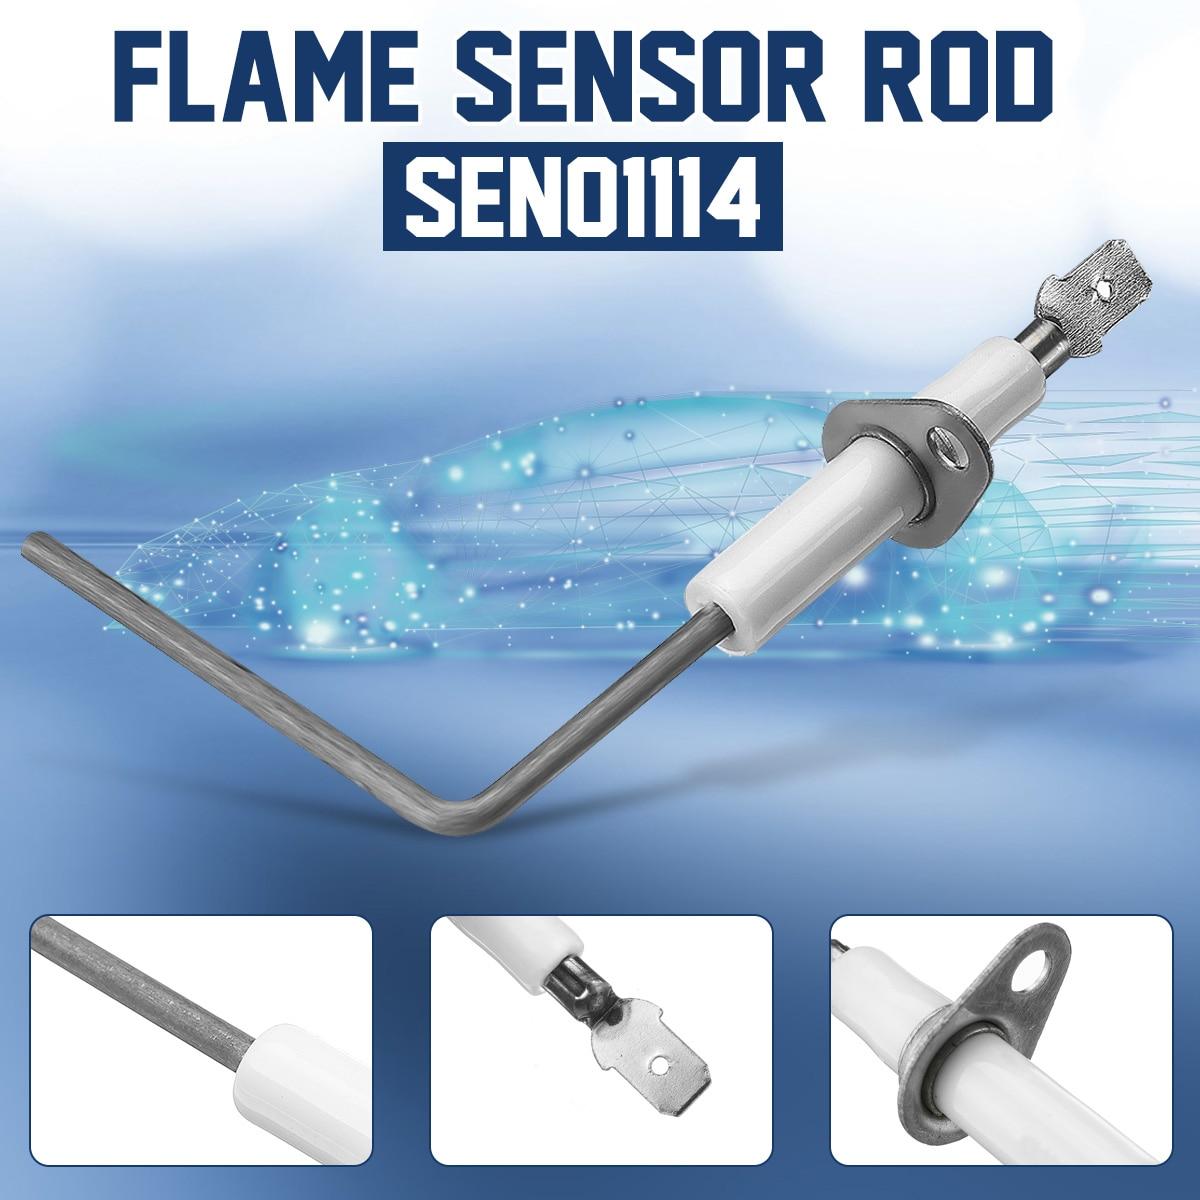 Flame Sensor Rod SEN0337 SEN441 SEN0441 SEN491 SEN00491 SEN1114 SEN01114